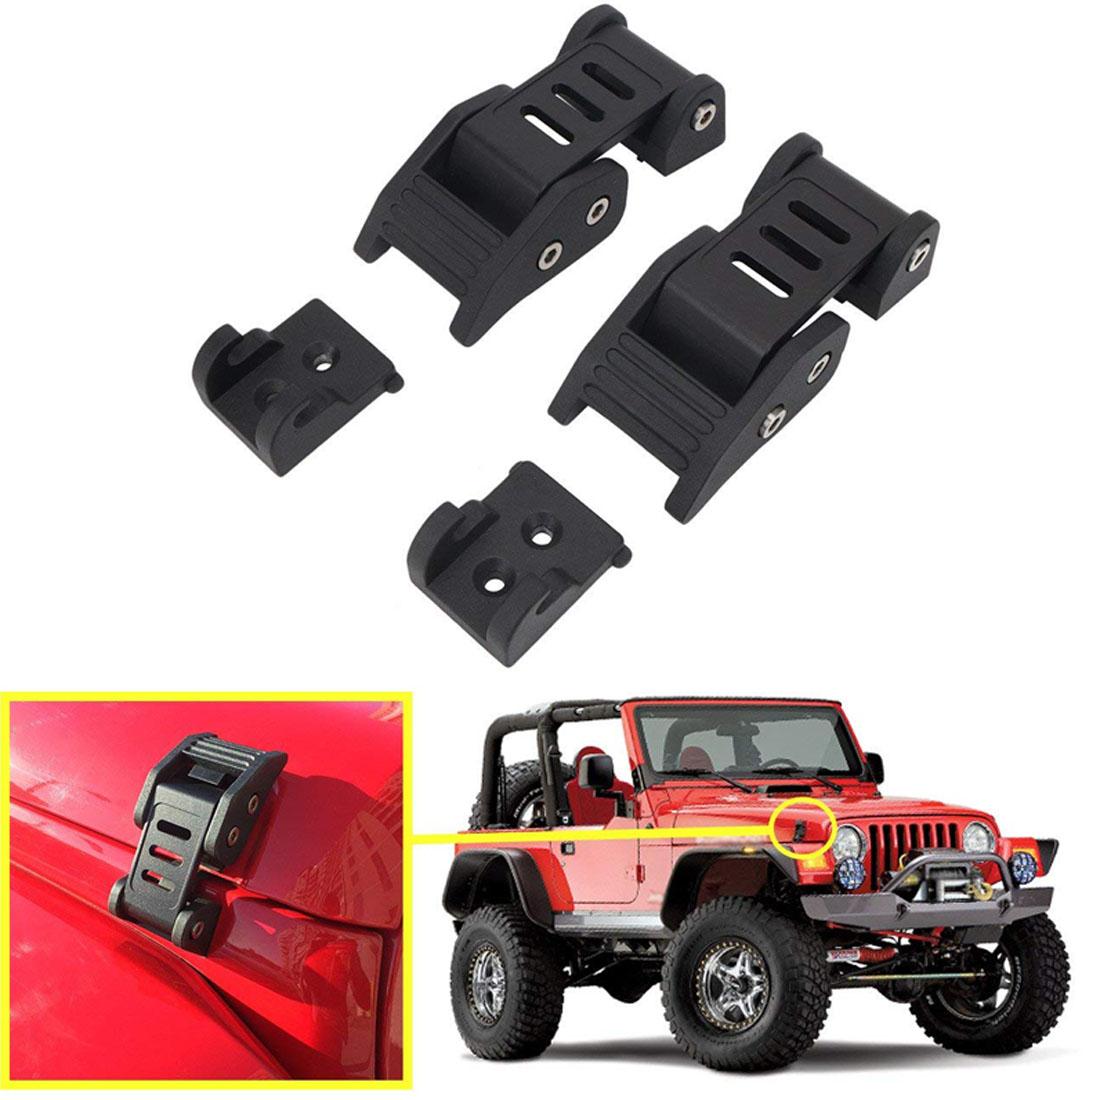 Rugged Ridge 11210.11 Hood Latch Assembly fits  2007-2018 Jeep Wrangler JK JKU